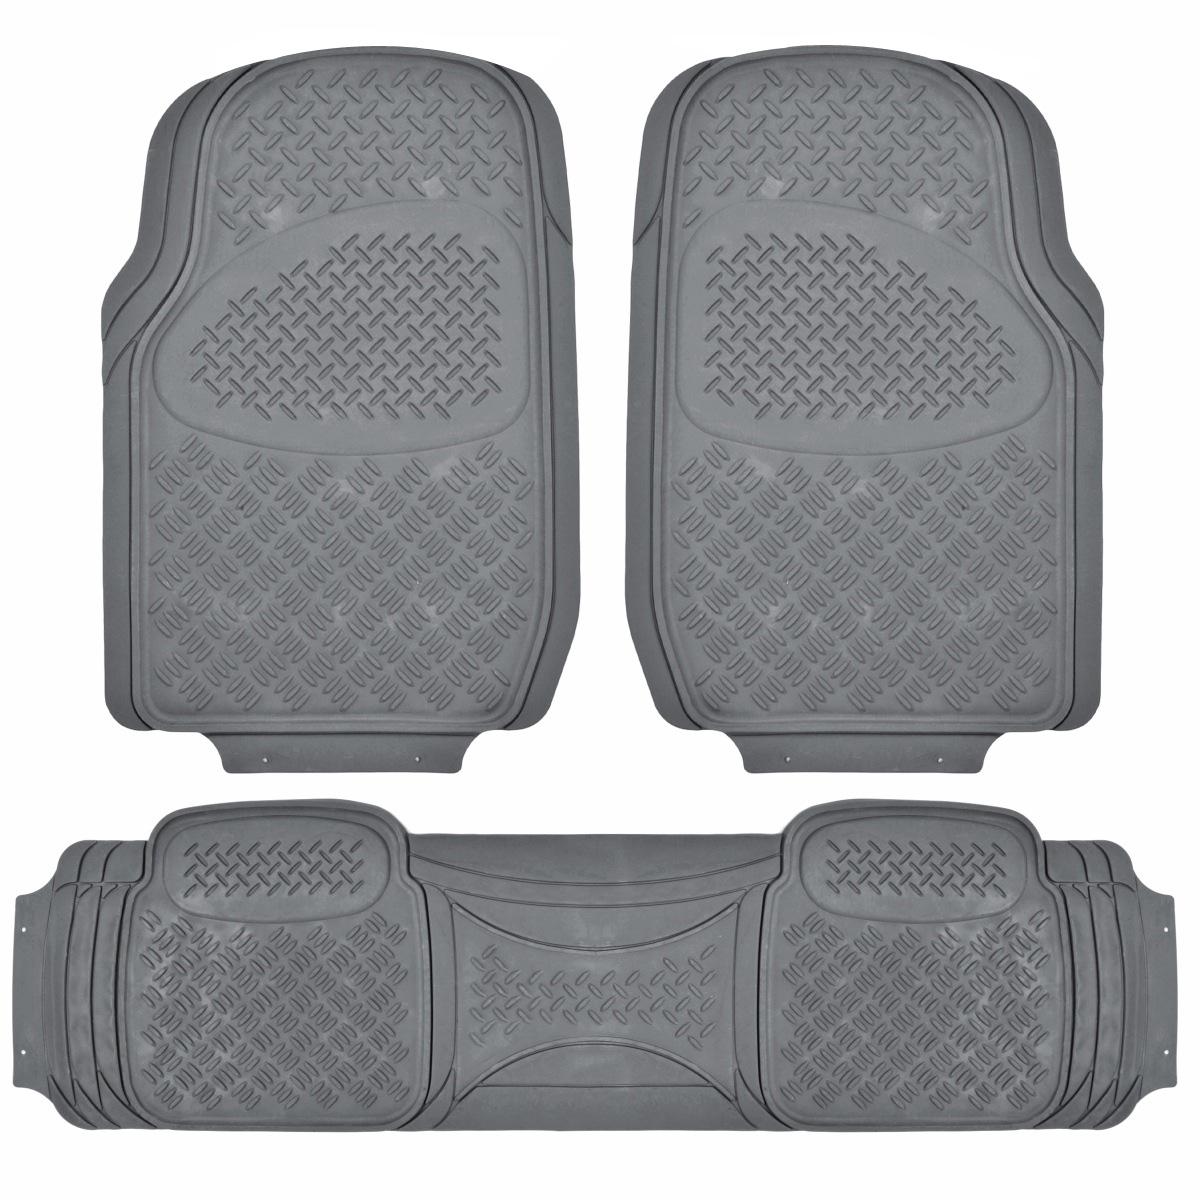 Floor mats volvo xc70 - Suv Floor Mat For 3 Row Car All